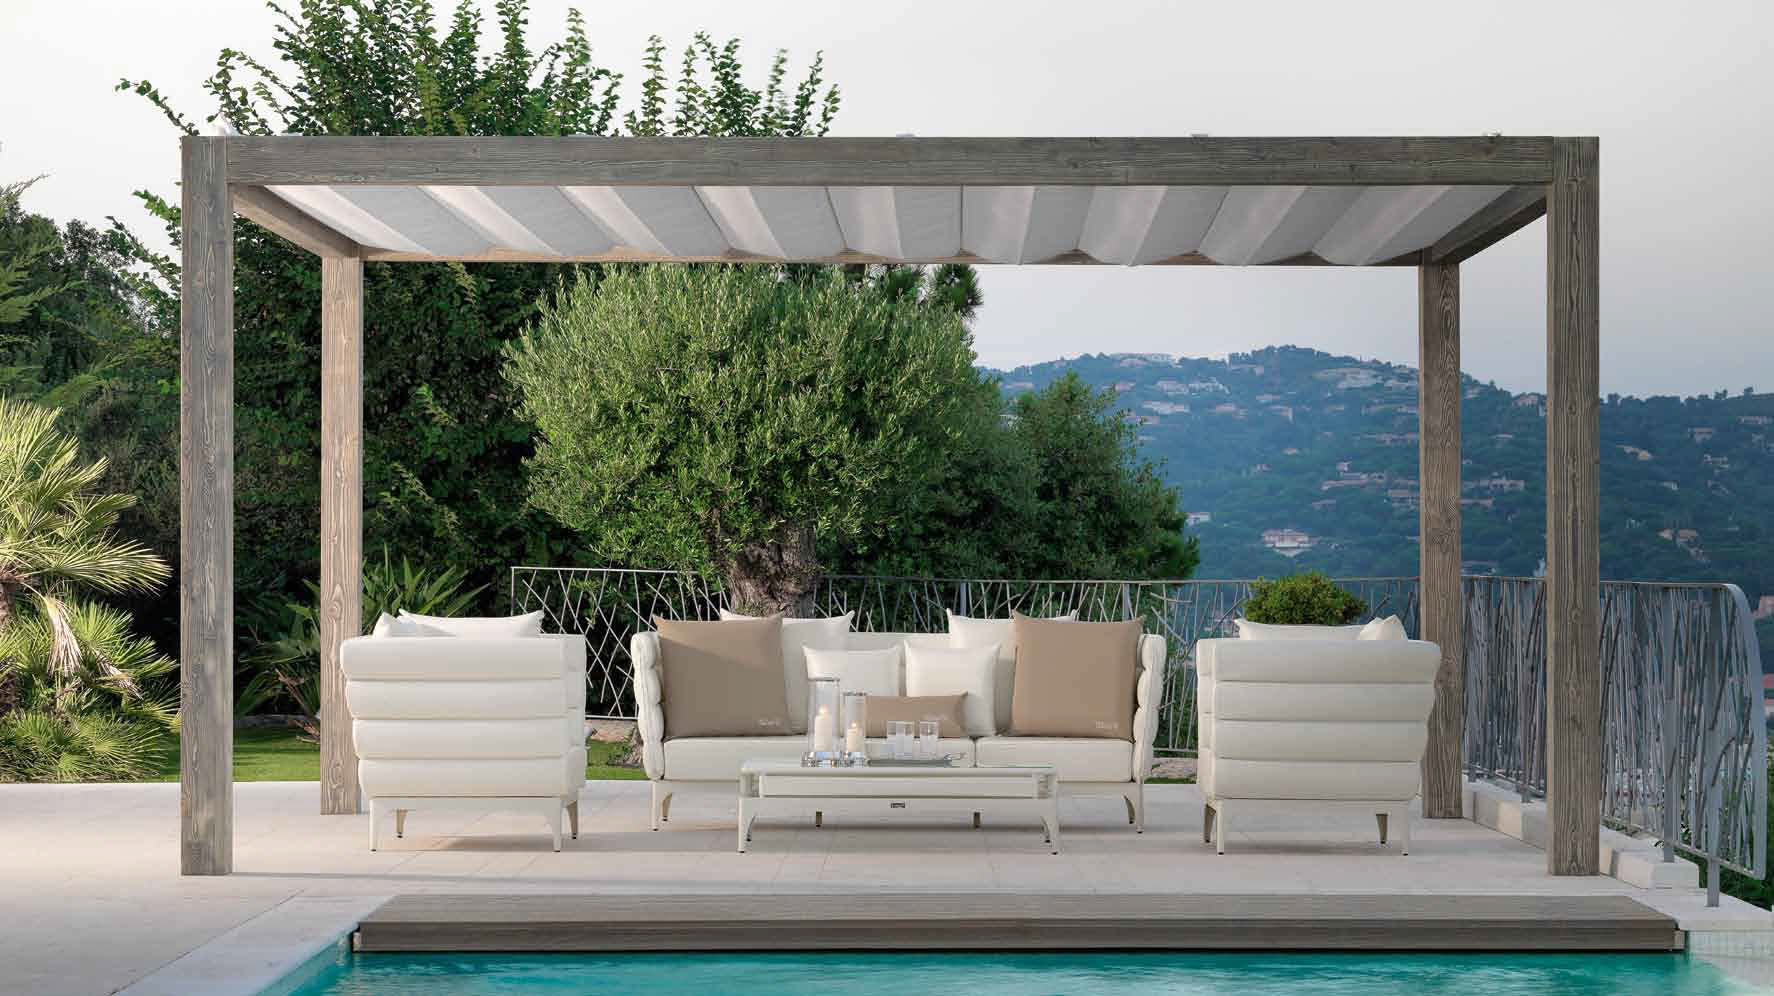 Arredo Moderno Giardino: Arredo per giardino set tavolo e poltrone dal ...